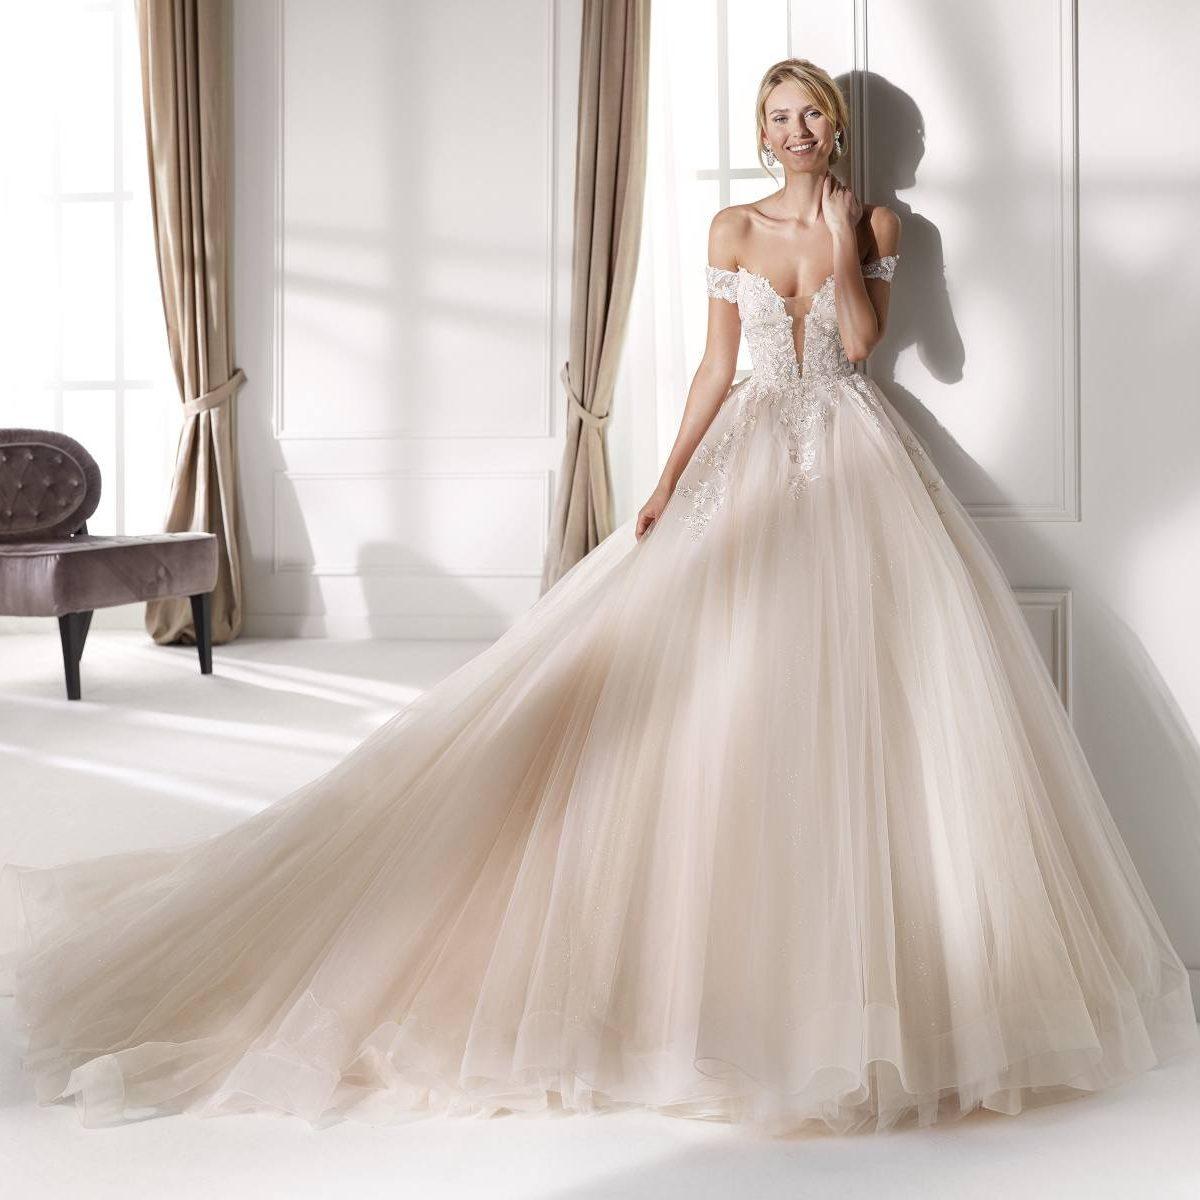 Elizabeth-Bridal-Nicole-20341